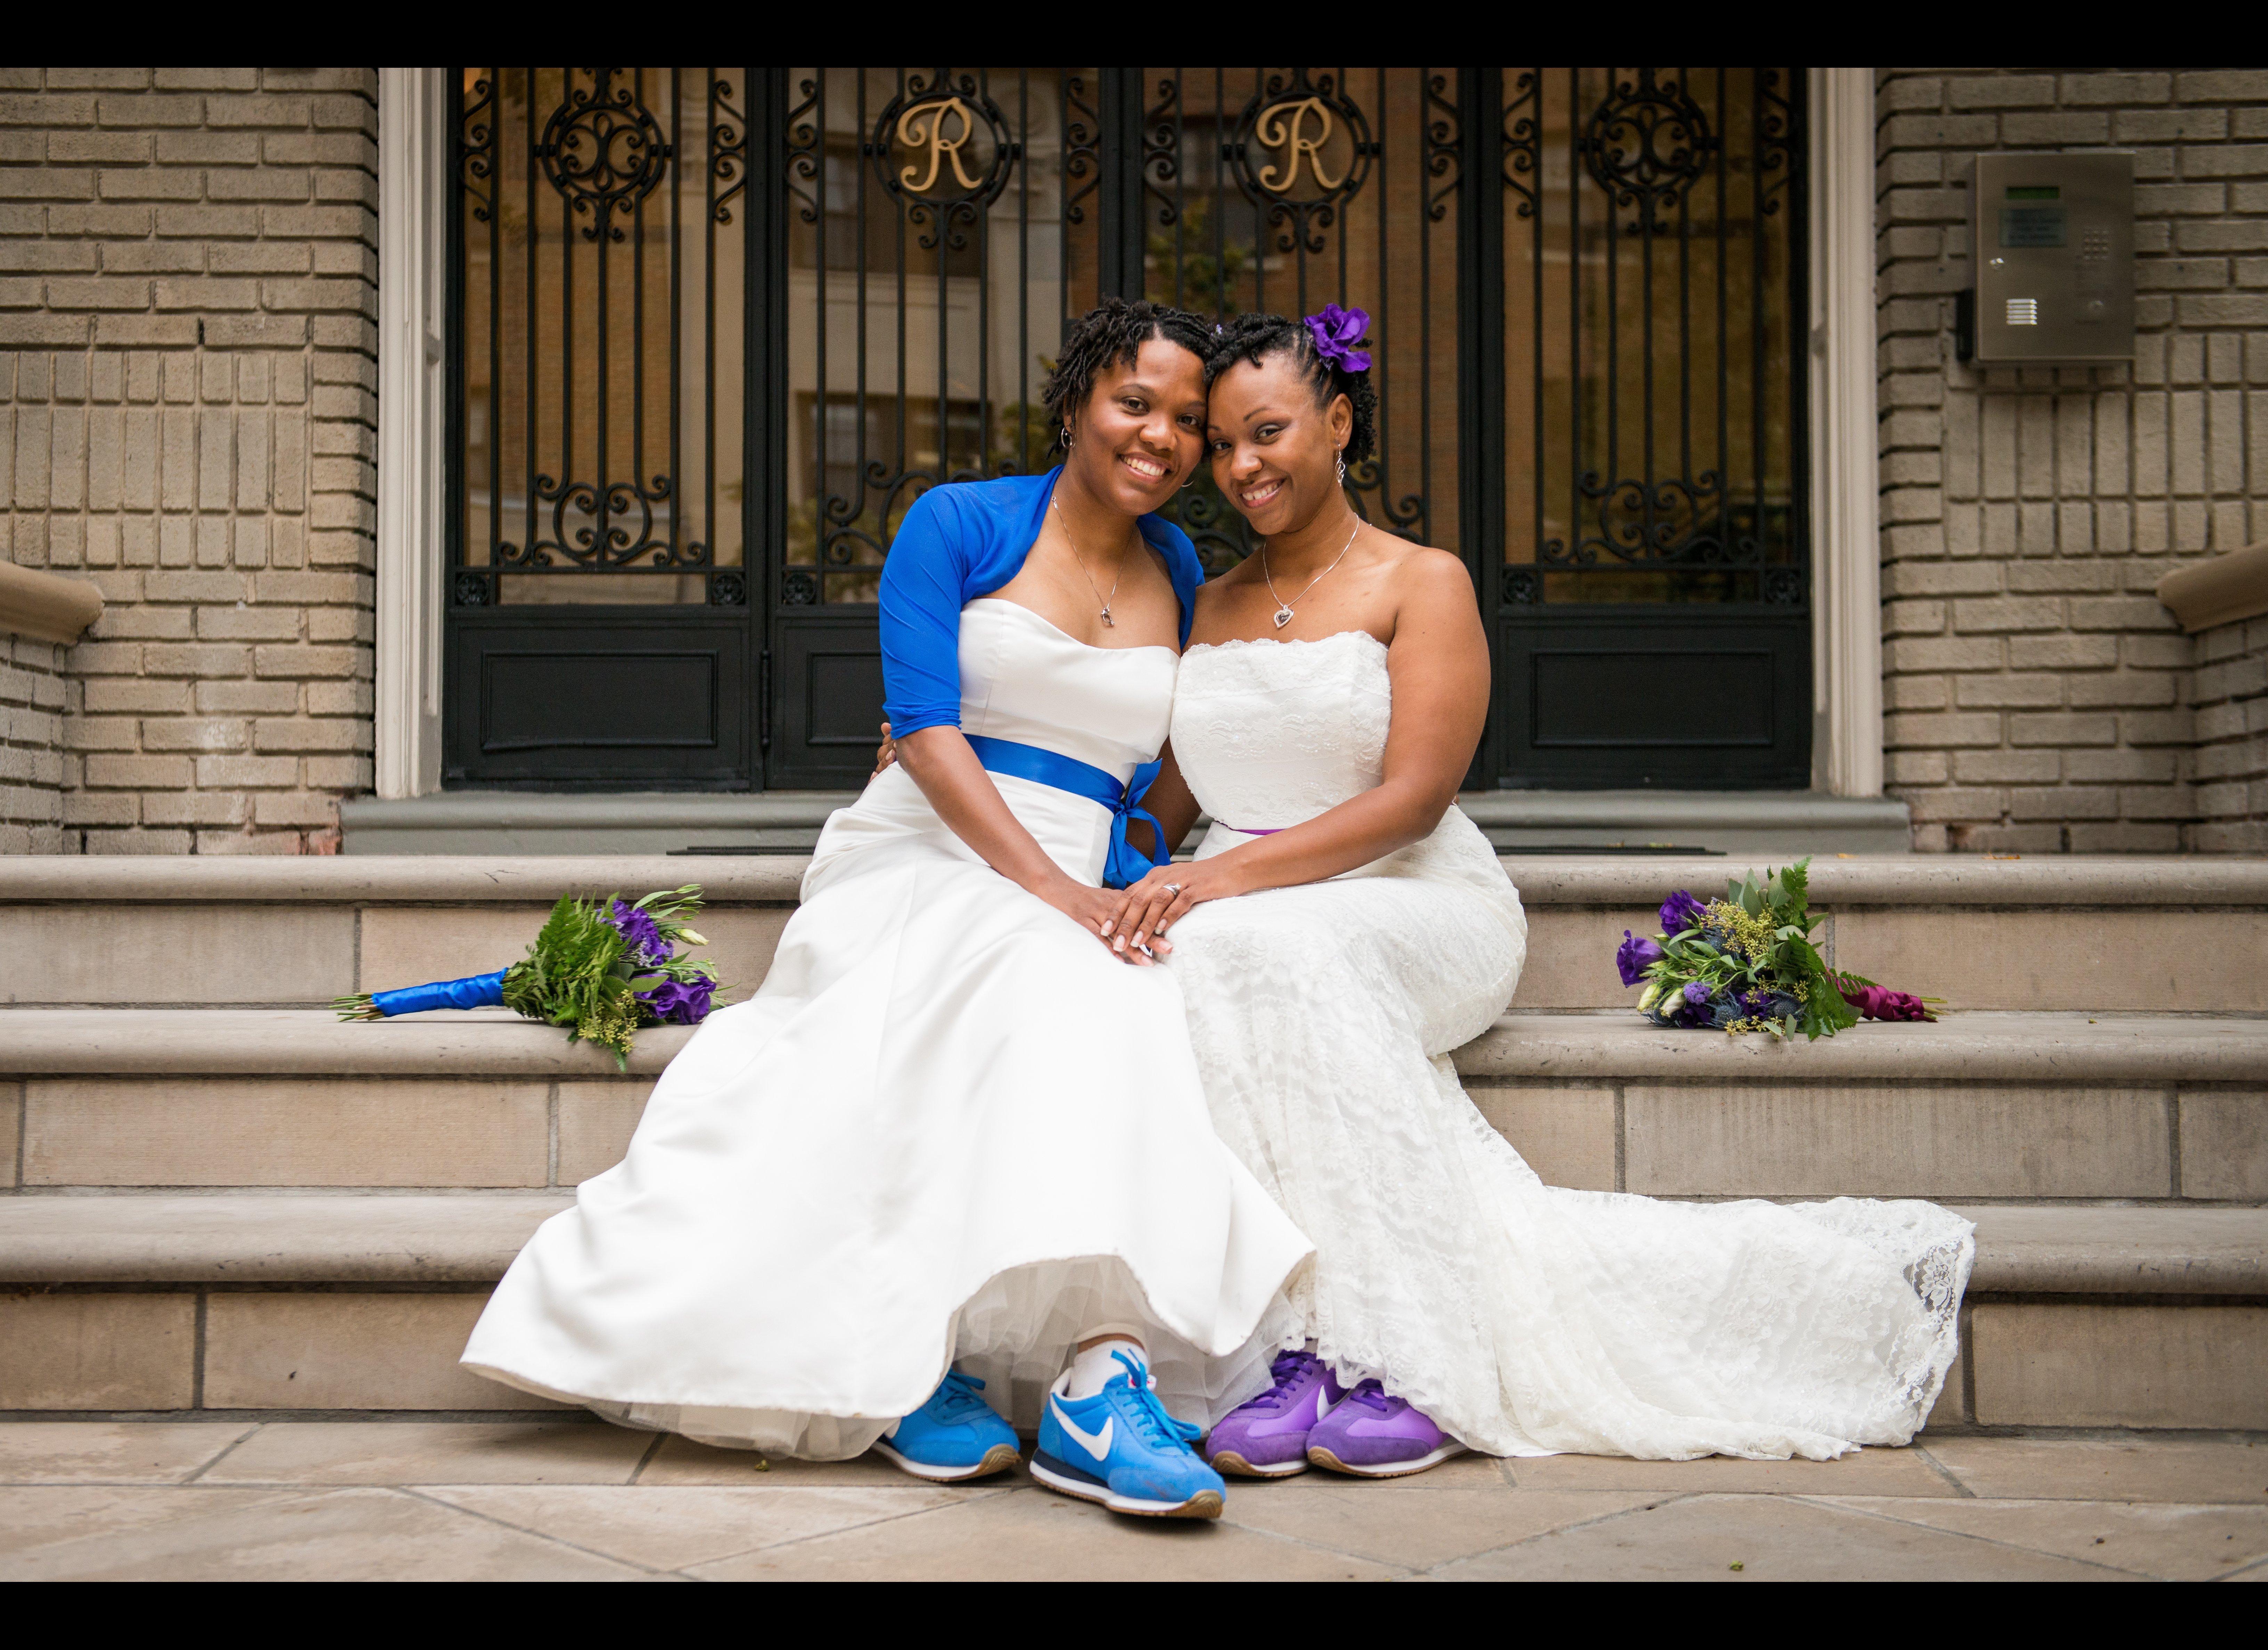 Gay and lesbian wedding photographers